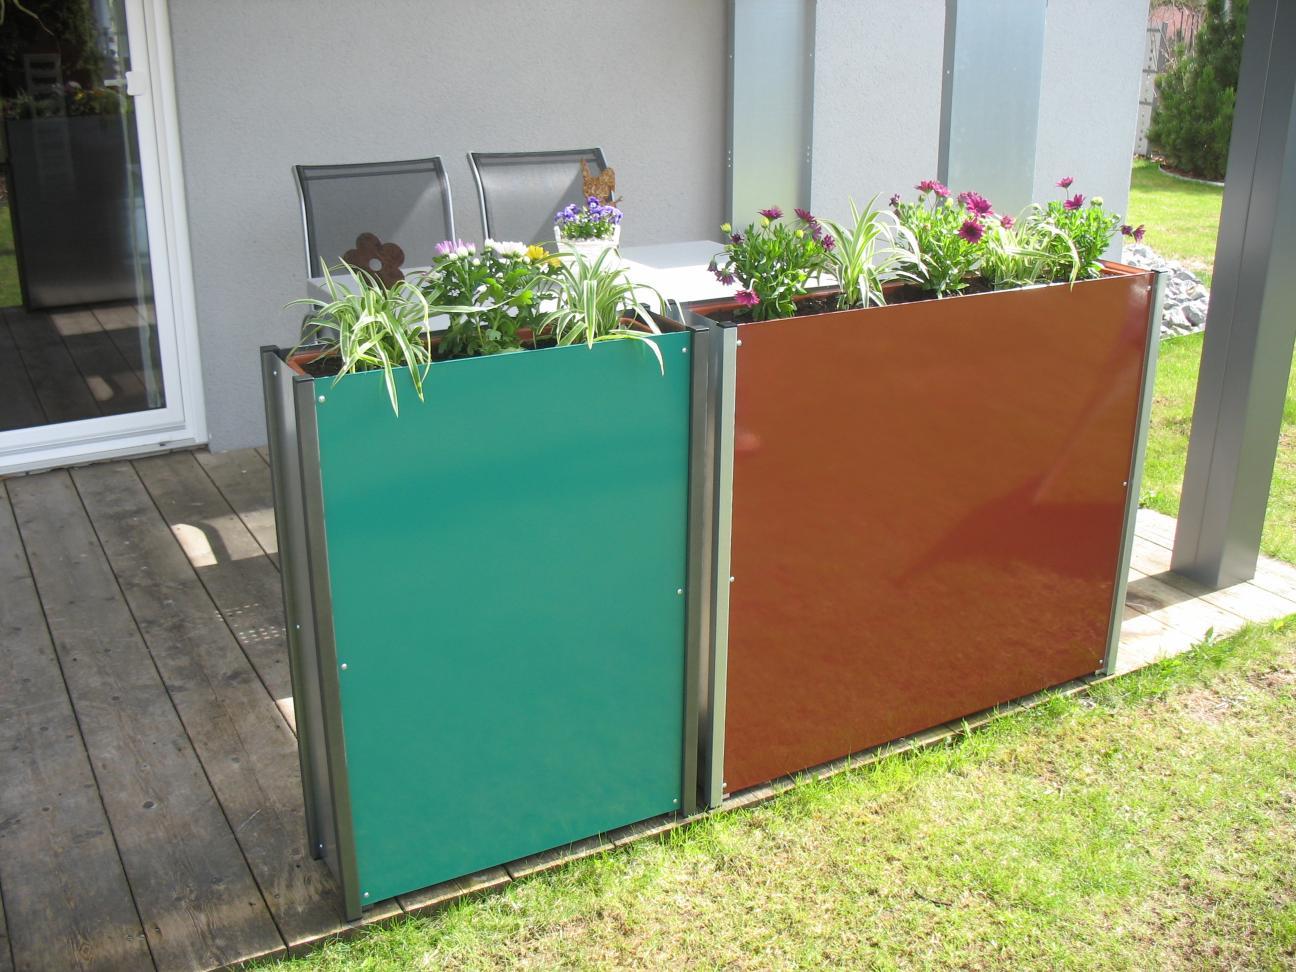 pflanzkasten blumenkasten in farbe gr e 90 cm x 66 cm. Black Bedroom Furniture Sets. Home Design Ideas